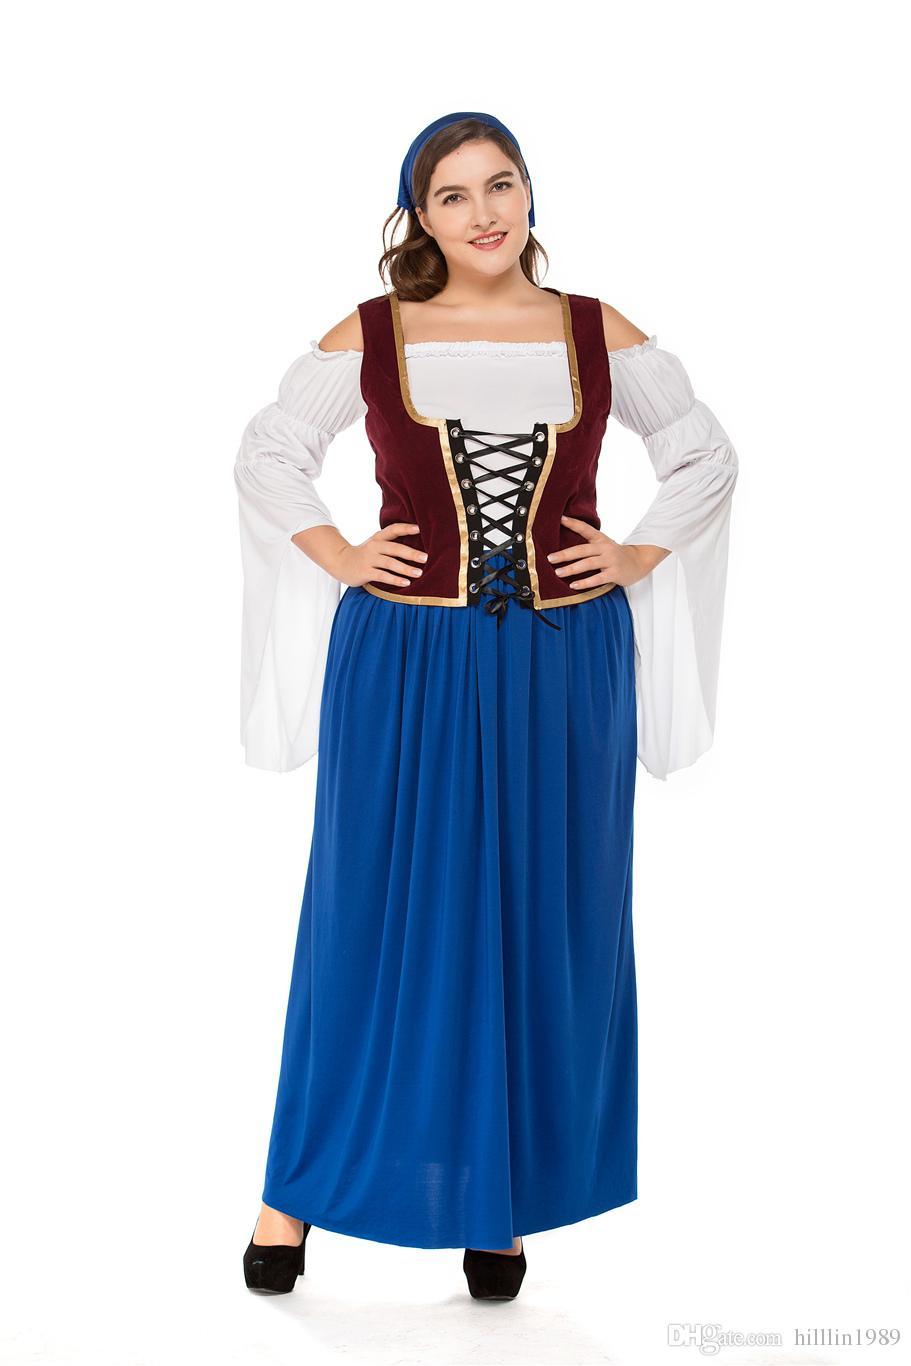 Plus Size German Women Oktoberfest Dress Mardi Gras Blue Cosplay Bavarian  Waitress Costume Carnival Large Size Beer Girl Fancy Dress Kids Costume  Discount ... 7ea203ed0be2